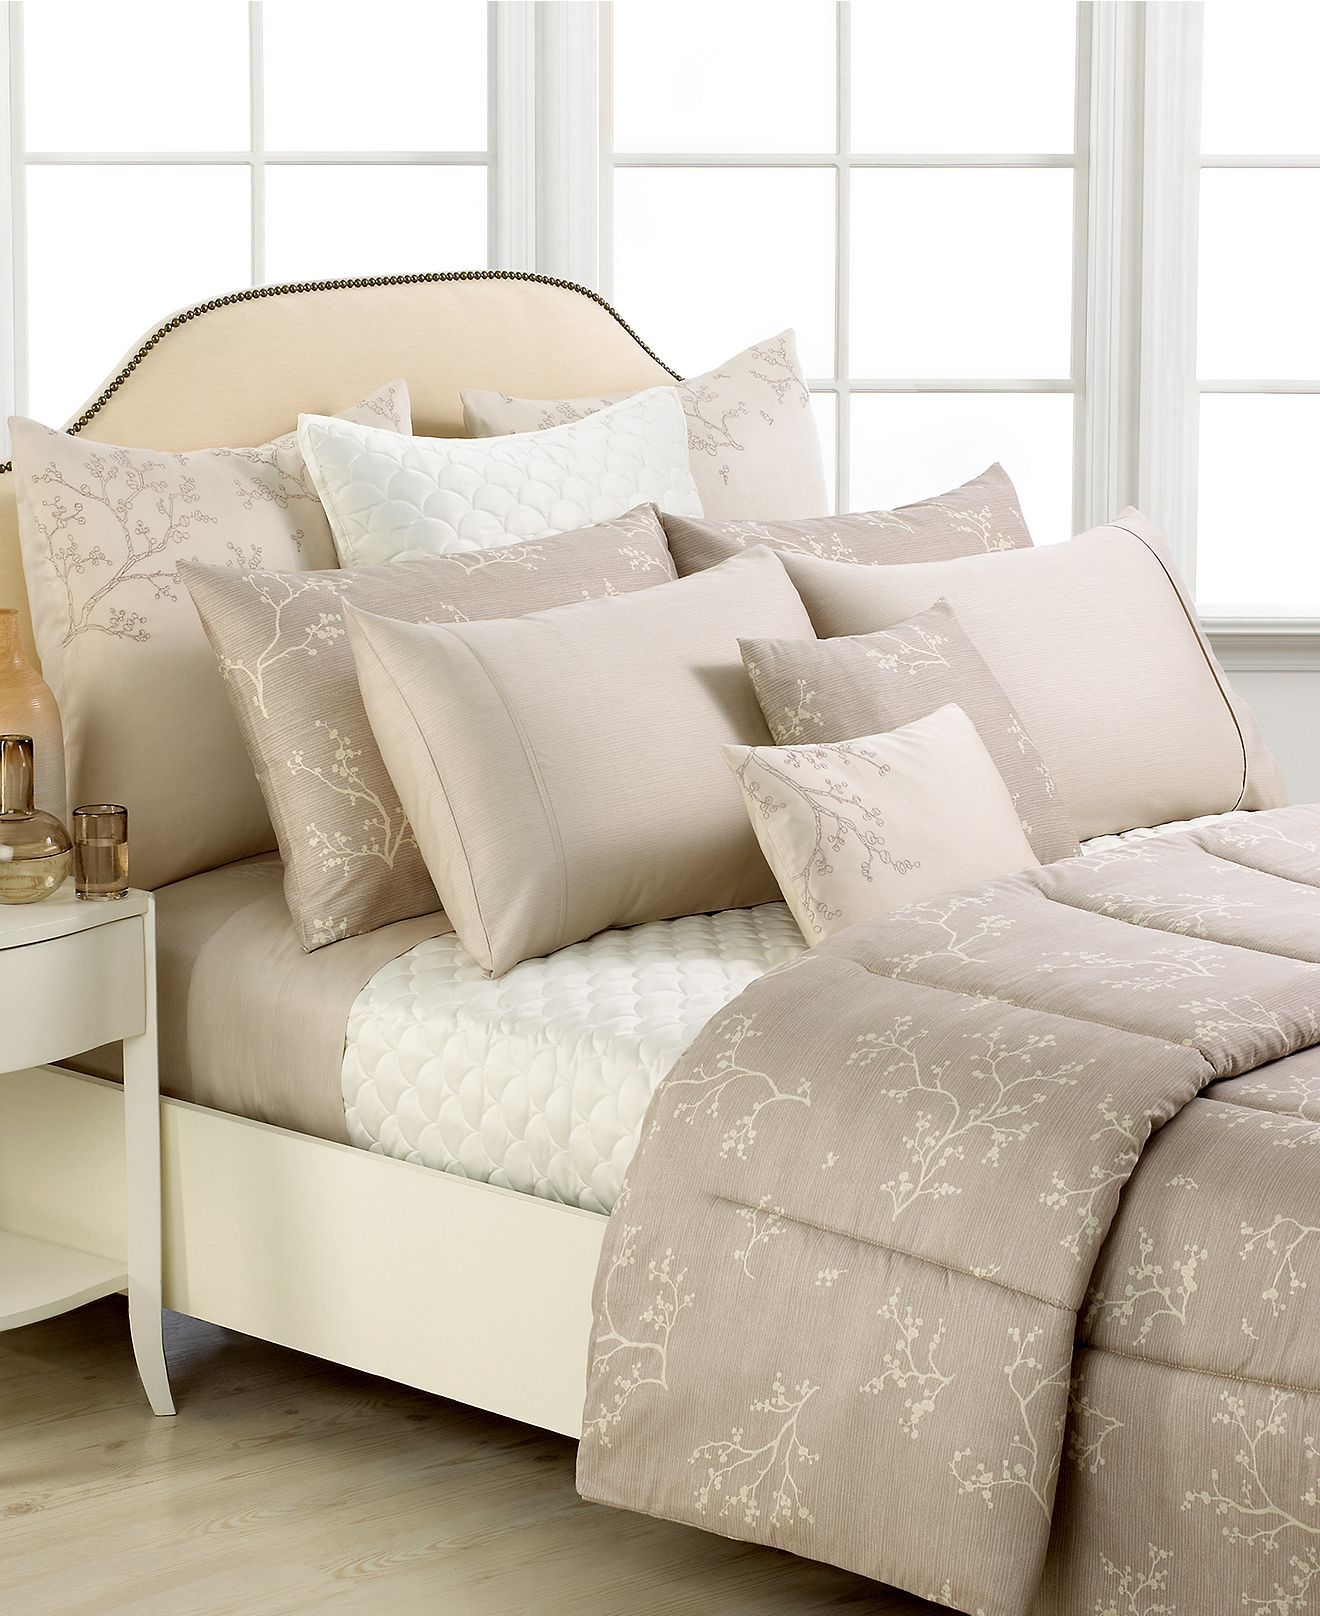 bed journalindahjuli florette bedding duvet barbara of barry x image photo poetical collection com nice